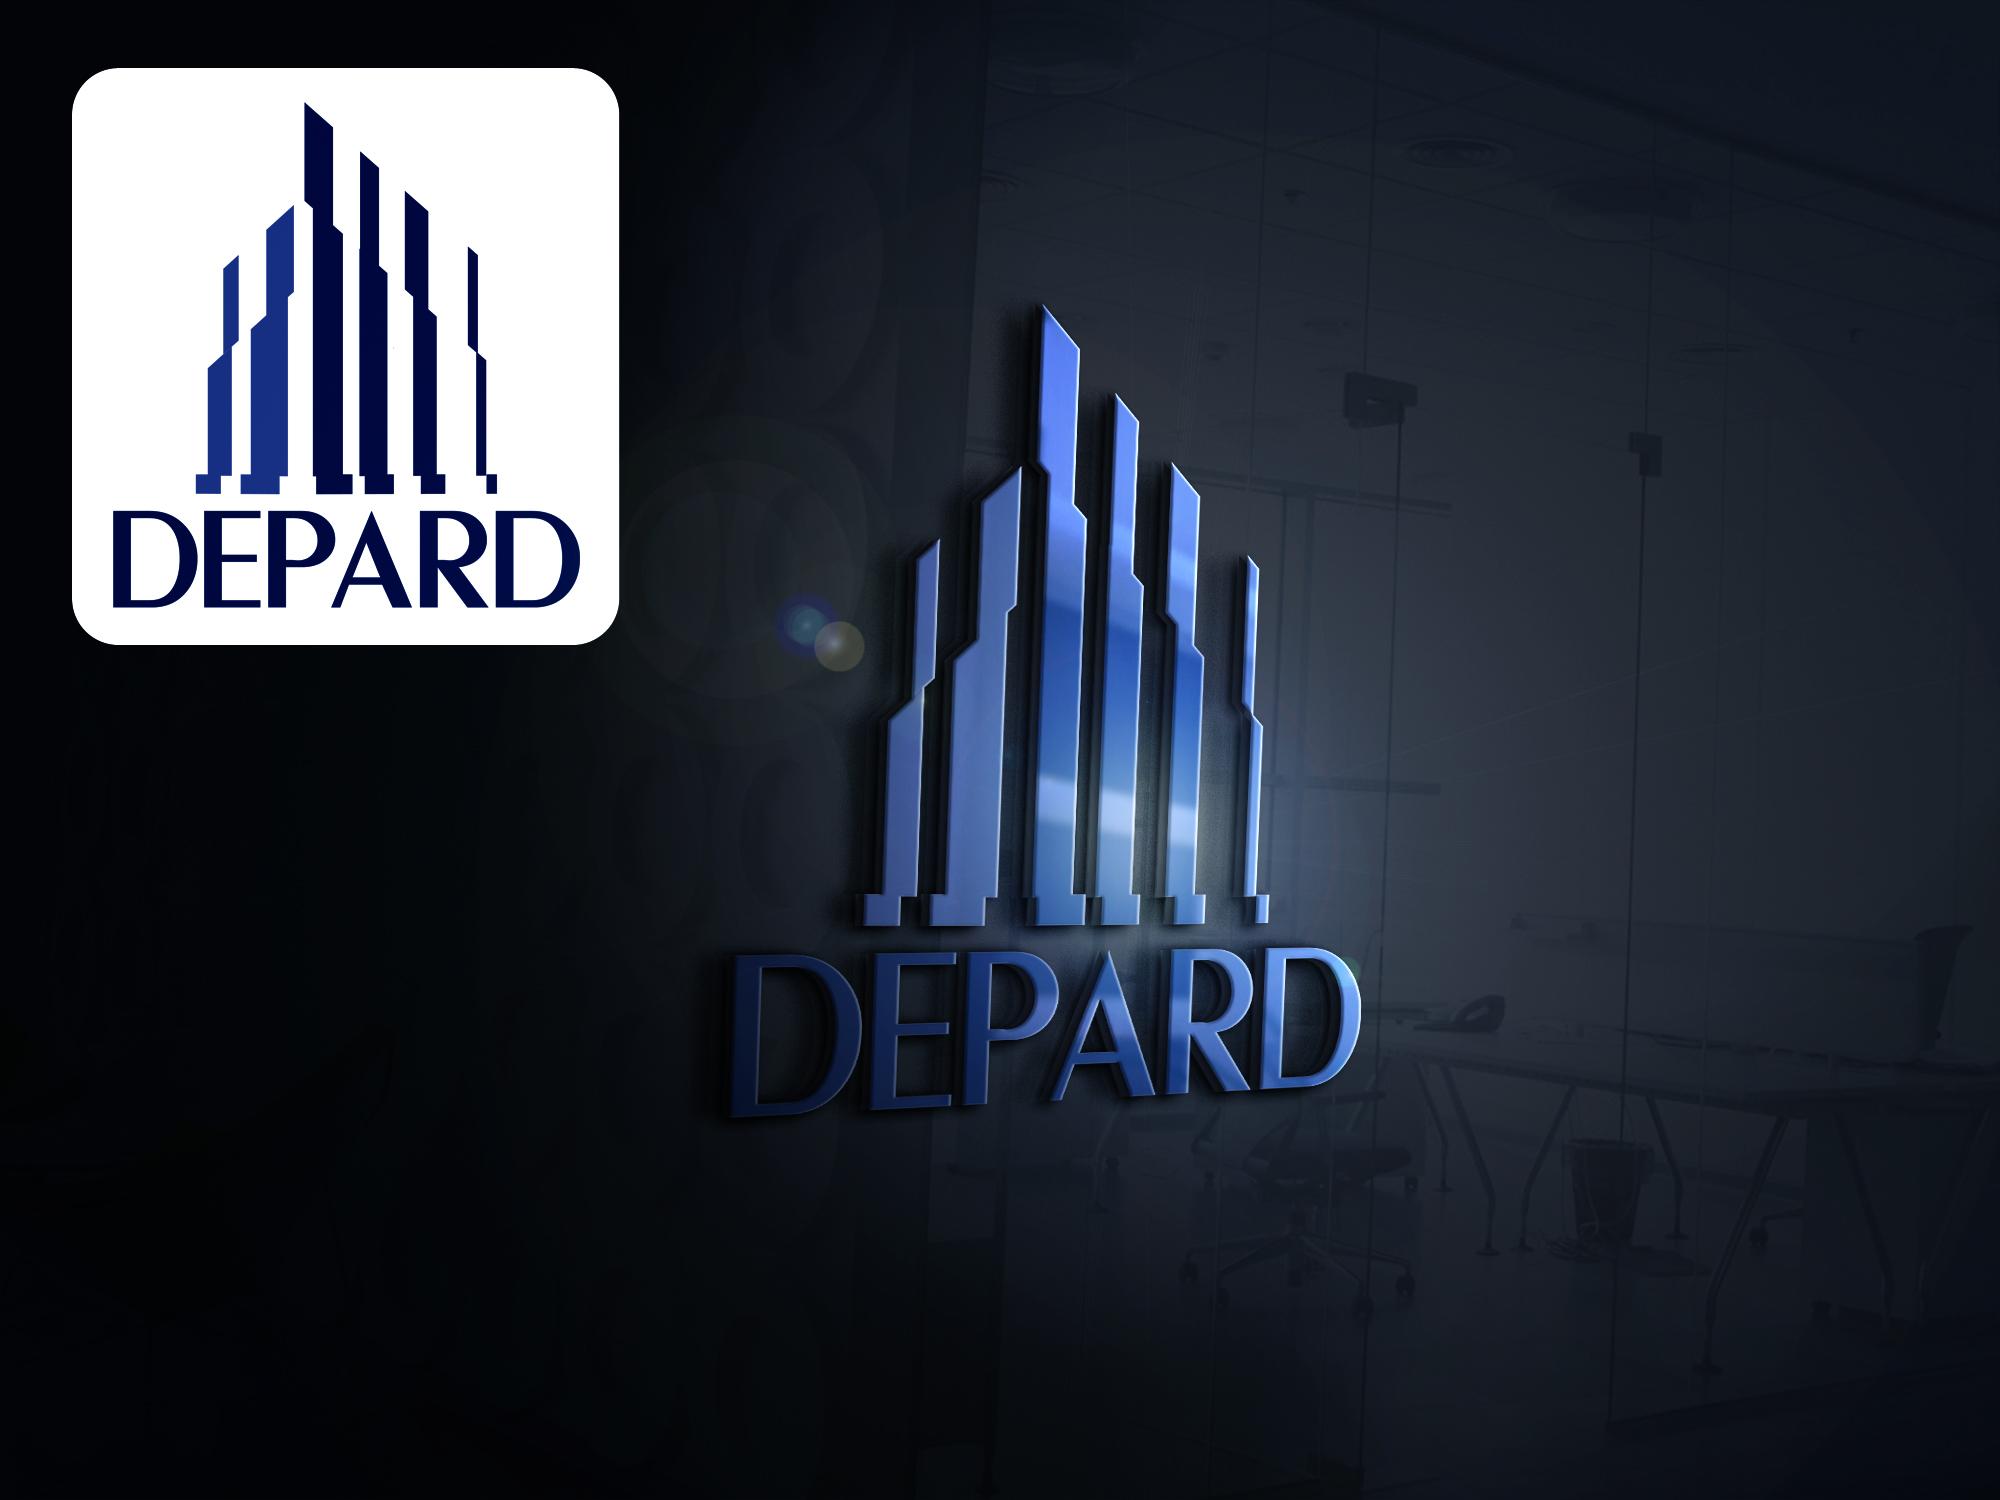 Логотип для компании (услуги недвижимость) фото f_02259358d9f2ce4f.jpg